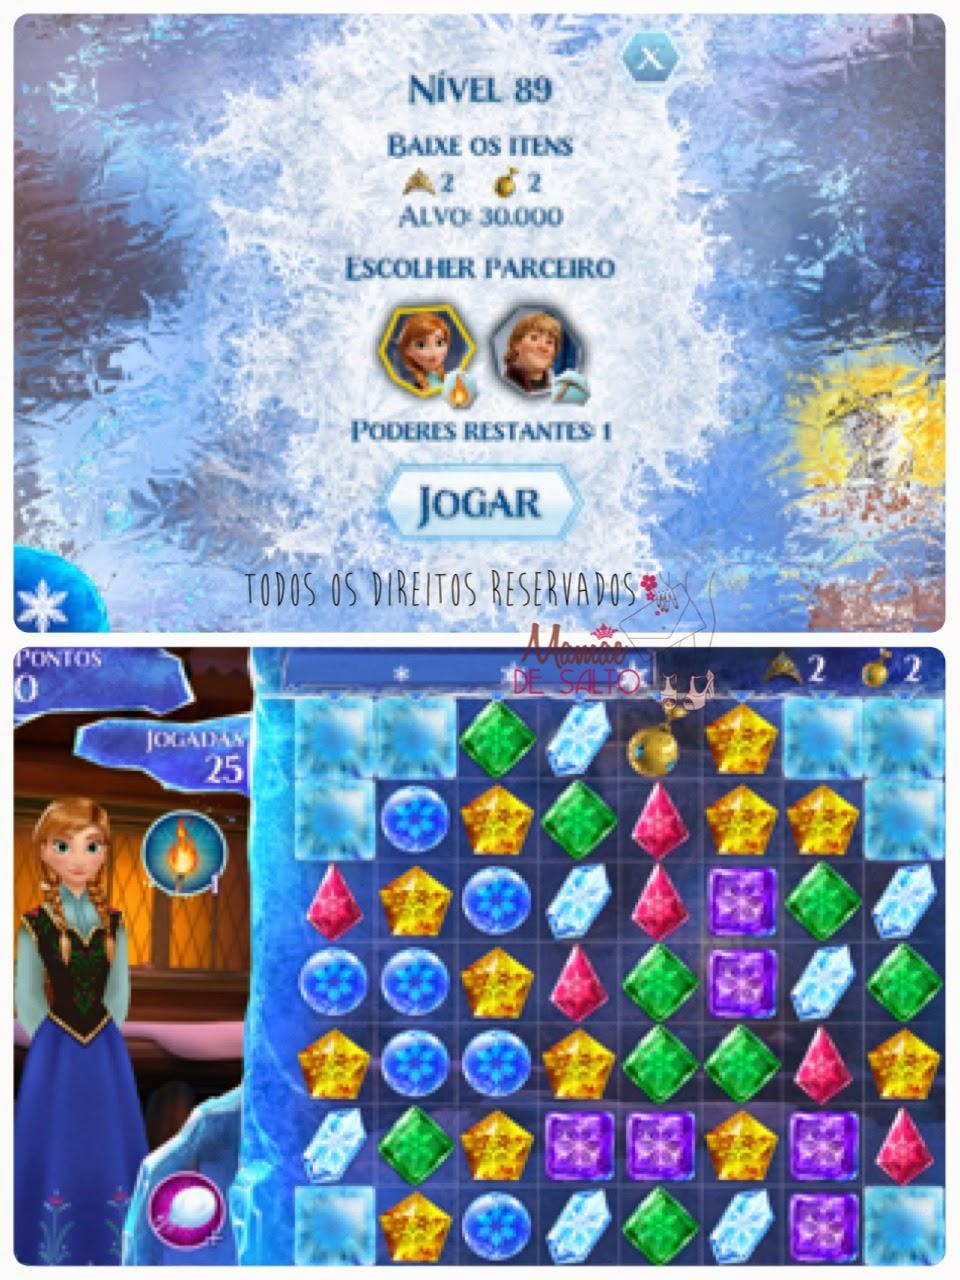 dica de aplicativo iphone e ipad jogos Frozen Free Fall - blog Mamãe de Salto